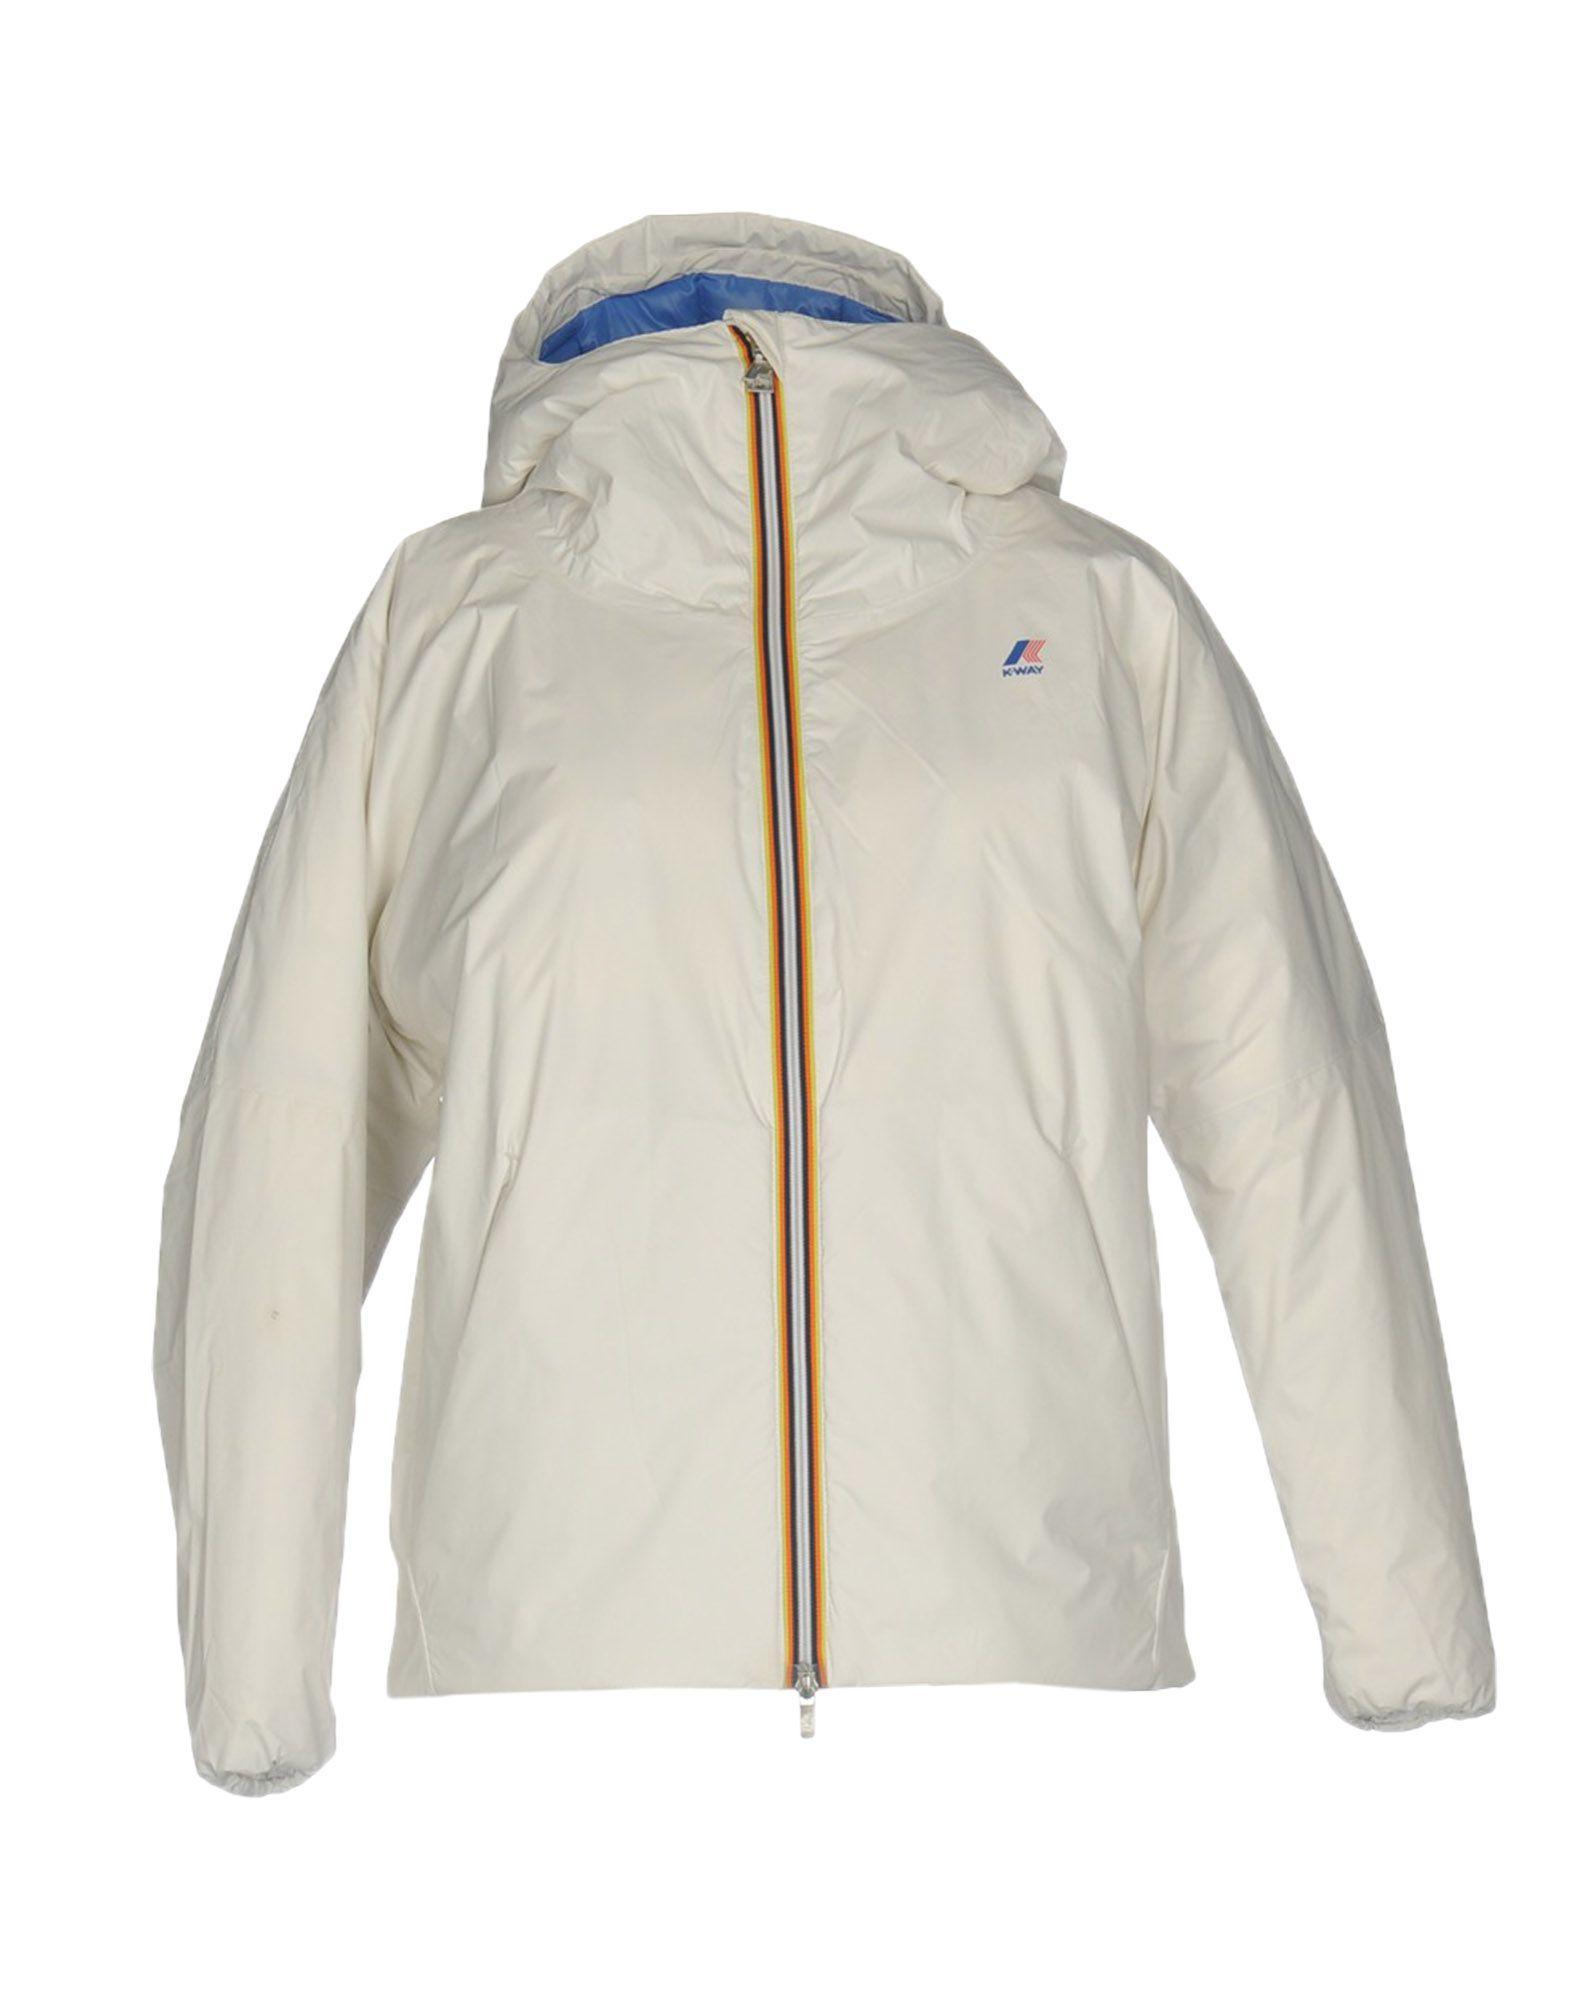 K-way Down Jacket In White